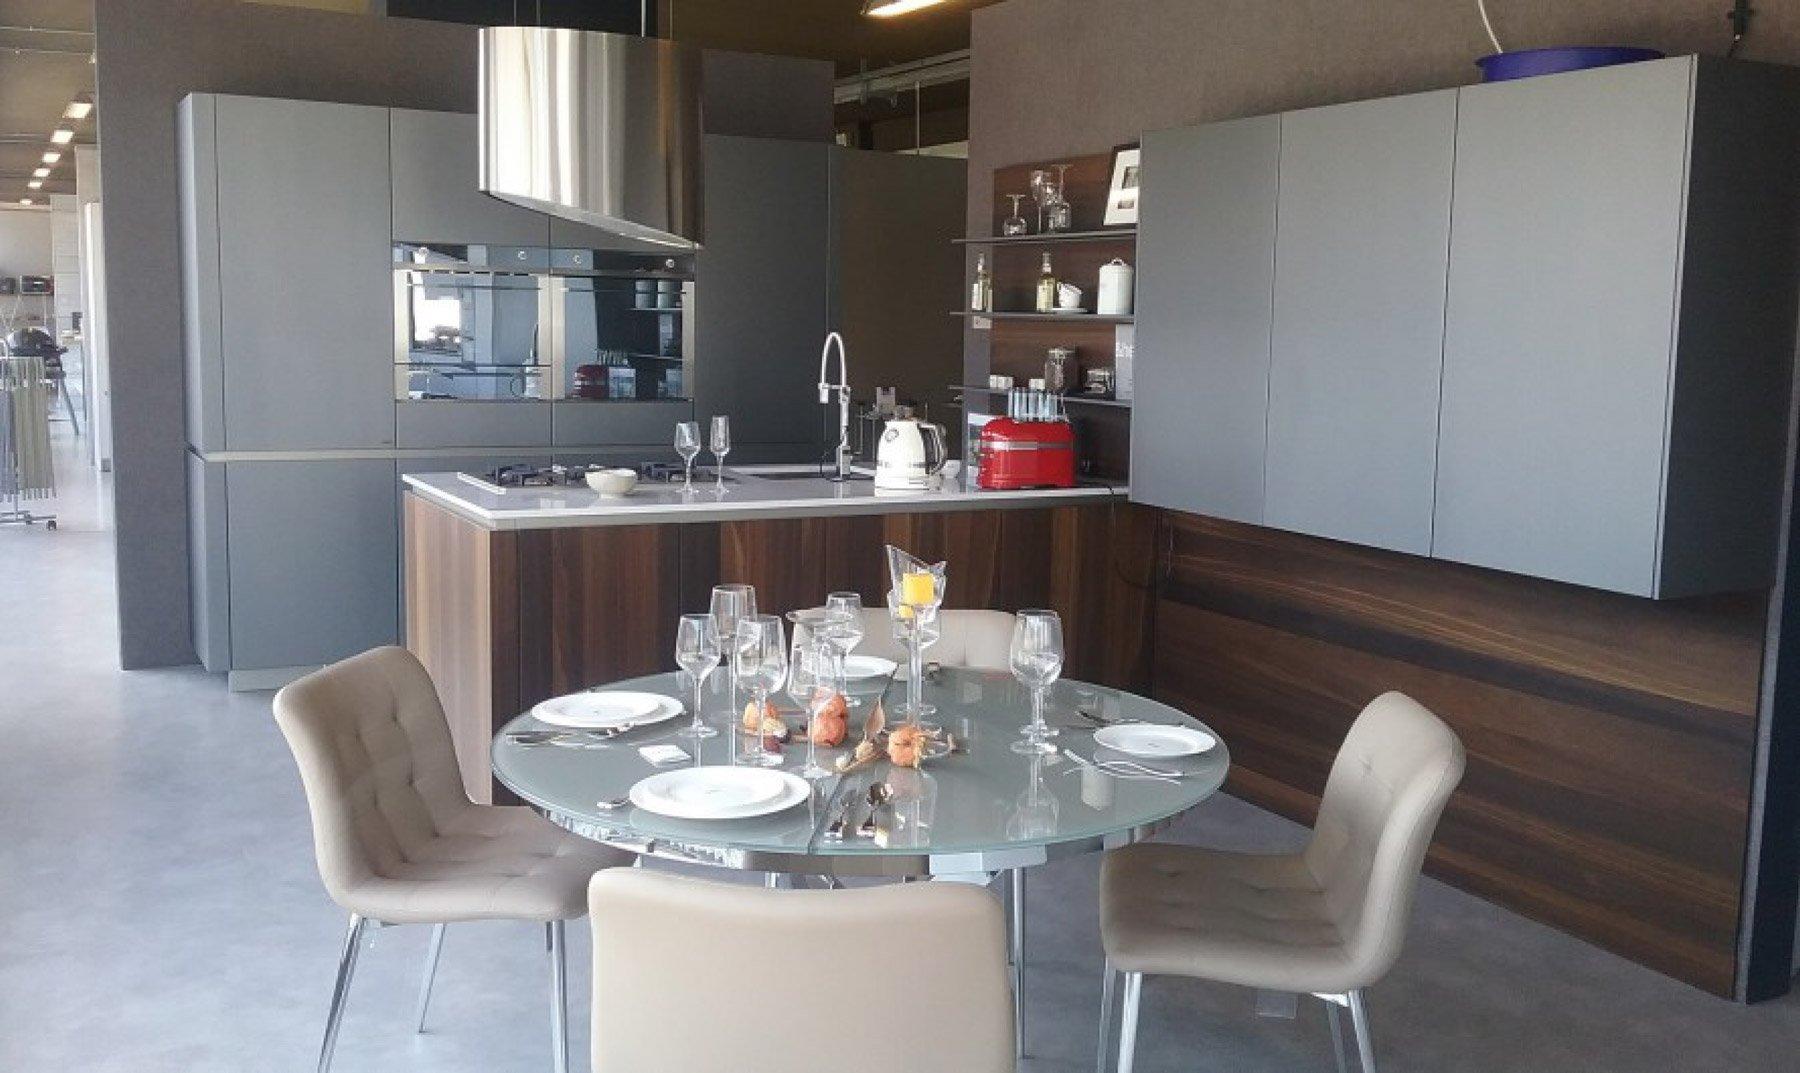 Cucina Way Snaidero | Cucina Moderna Impiallacciata In Legno Con ...